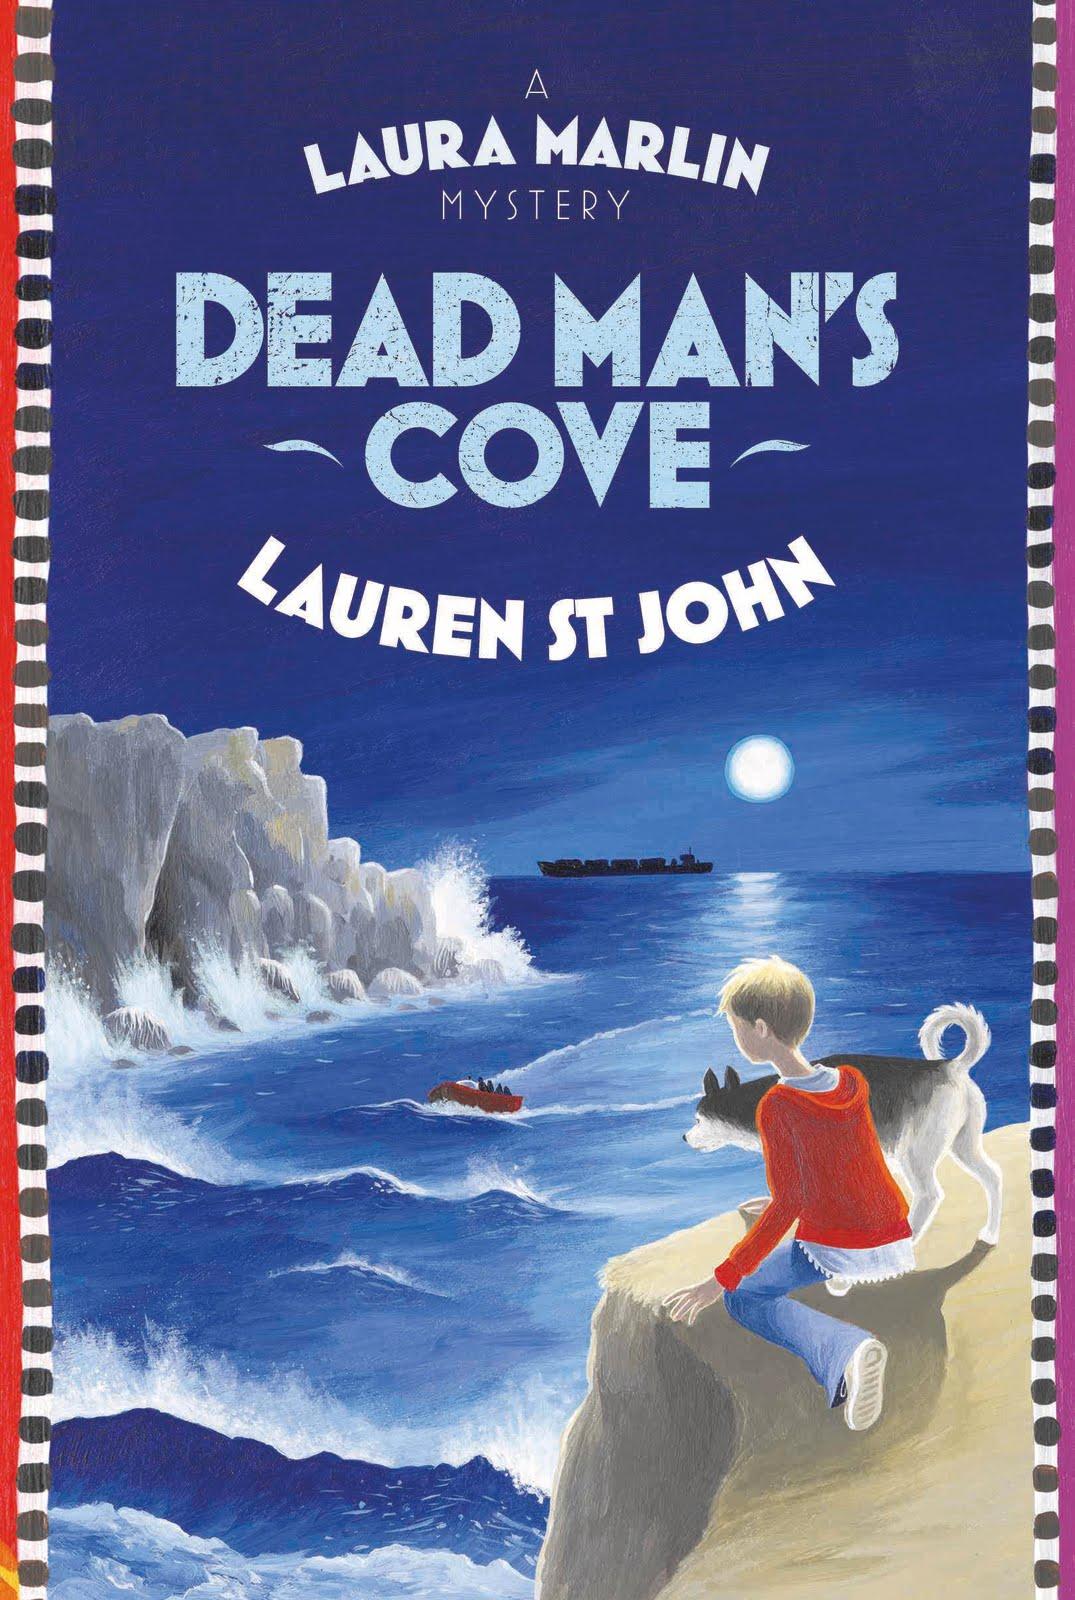 Dead Man's Cove